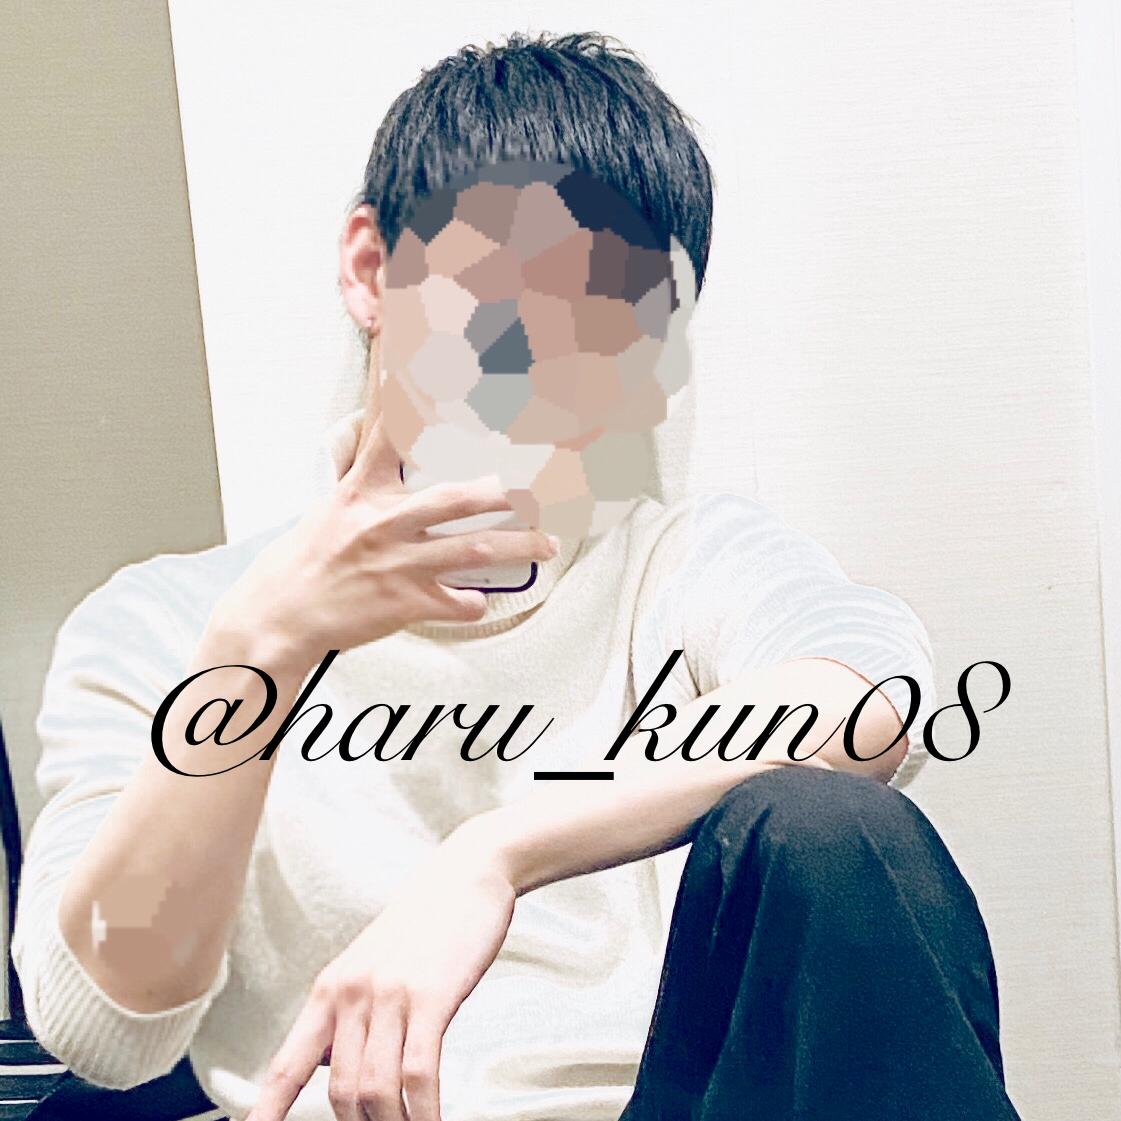 Haru(ハル)くん